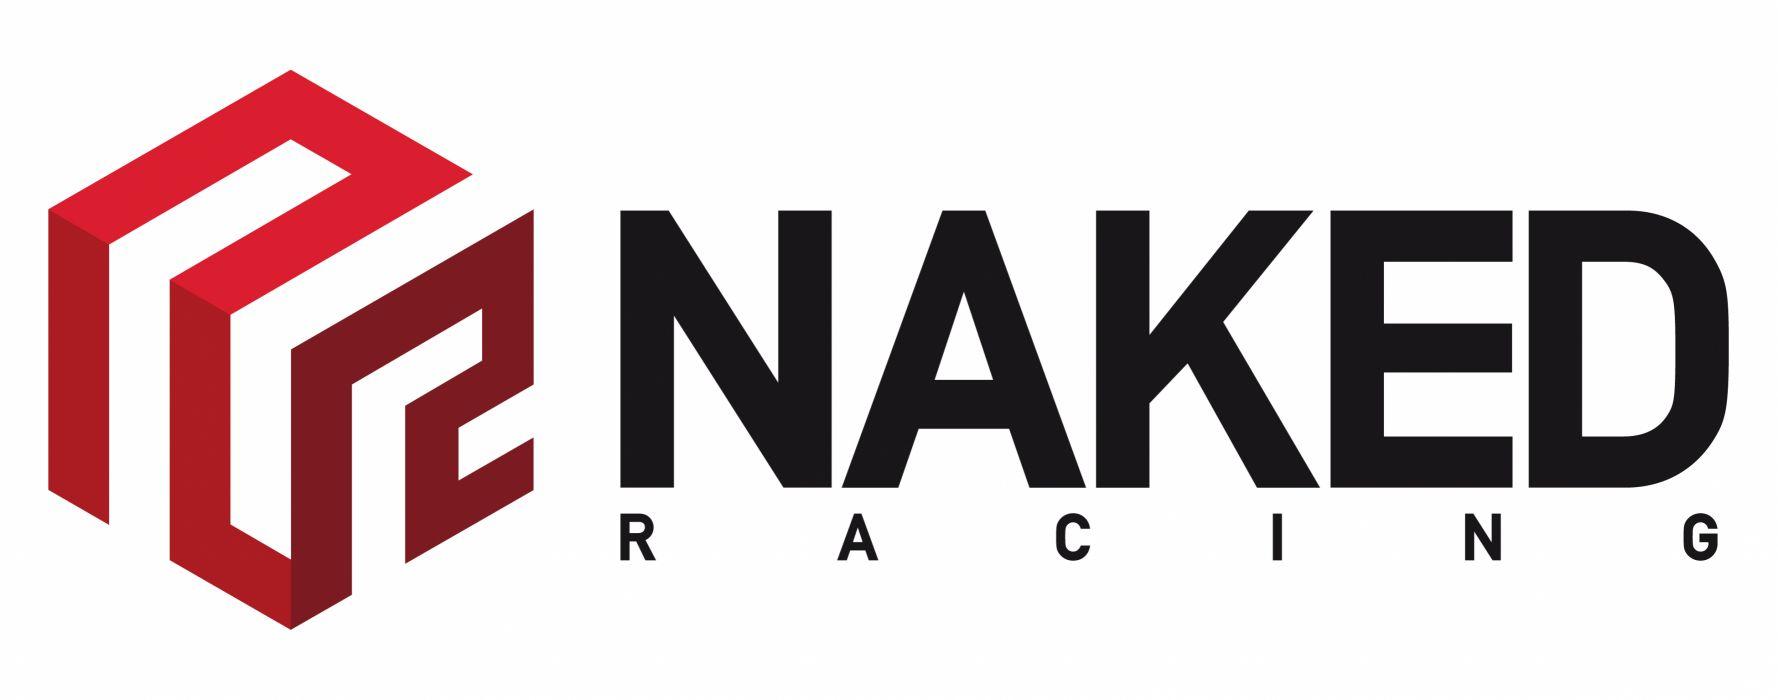 racing logo race   jd wallpaper